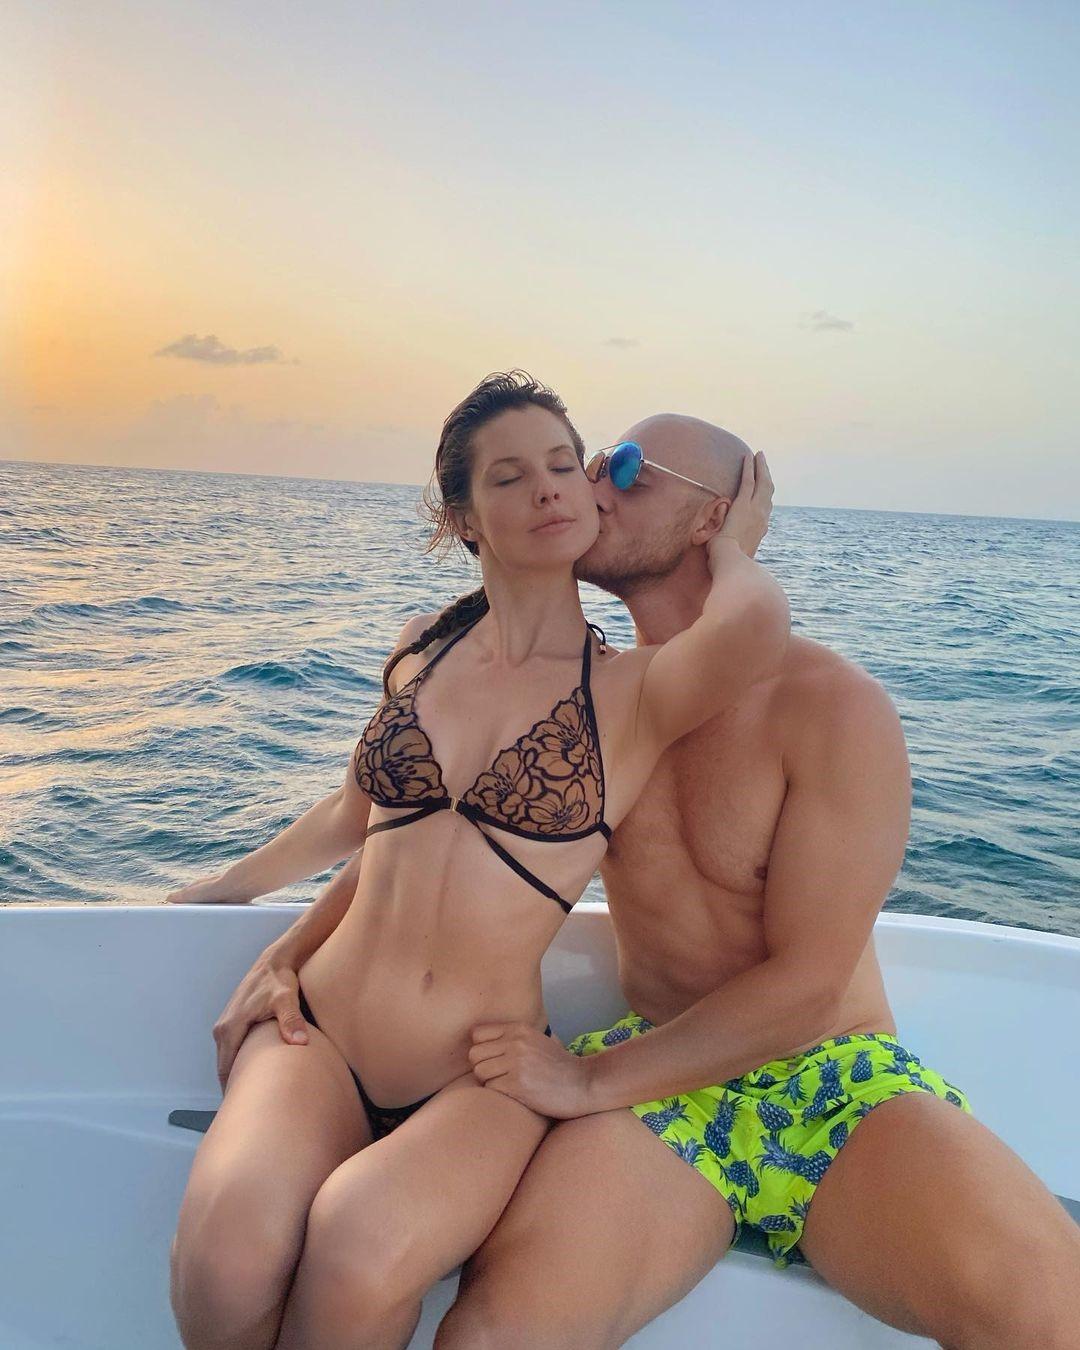 Amanda Cerny and her Boyfriend